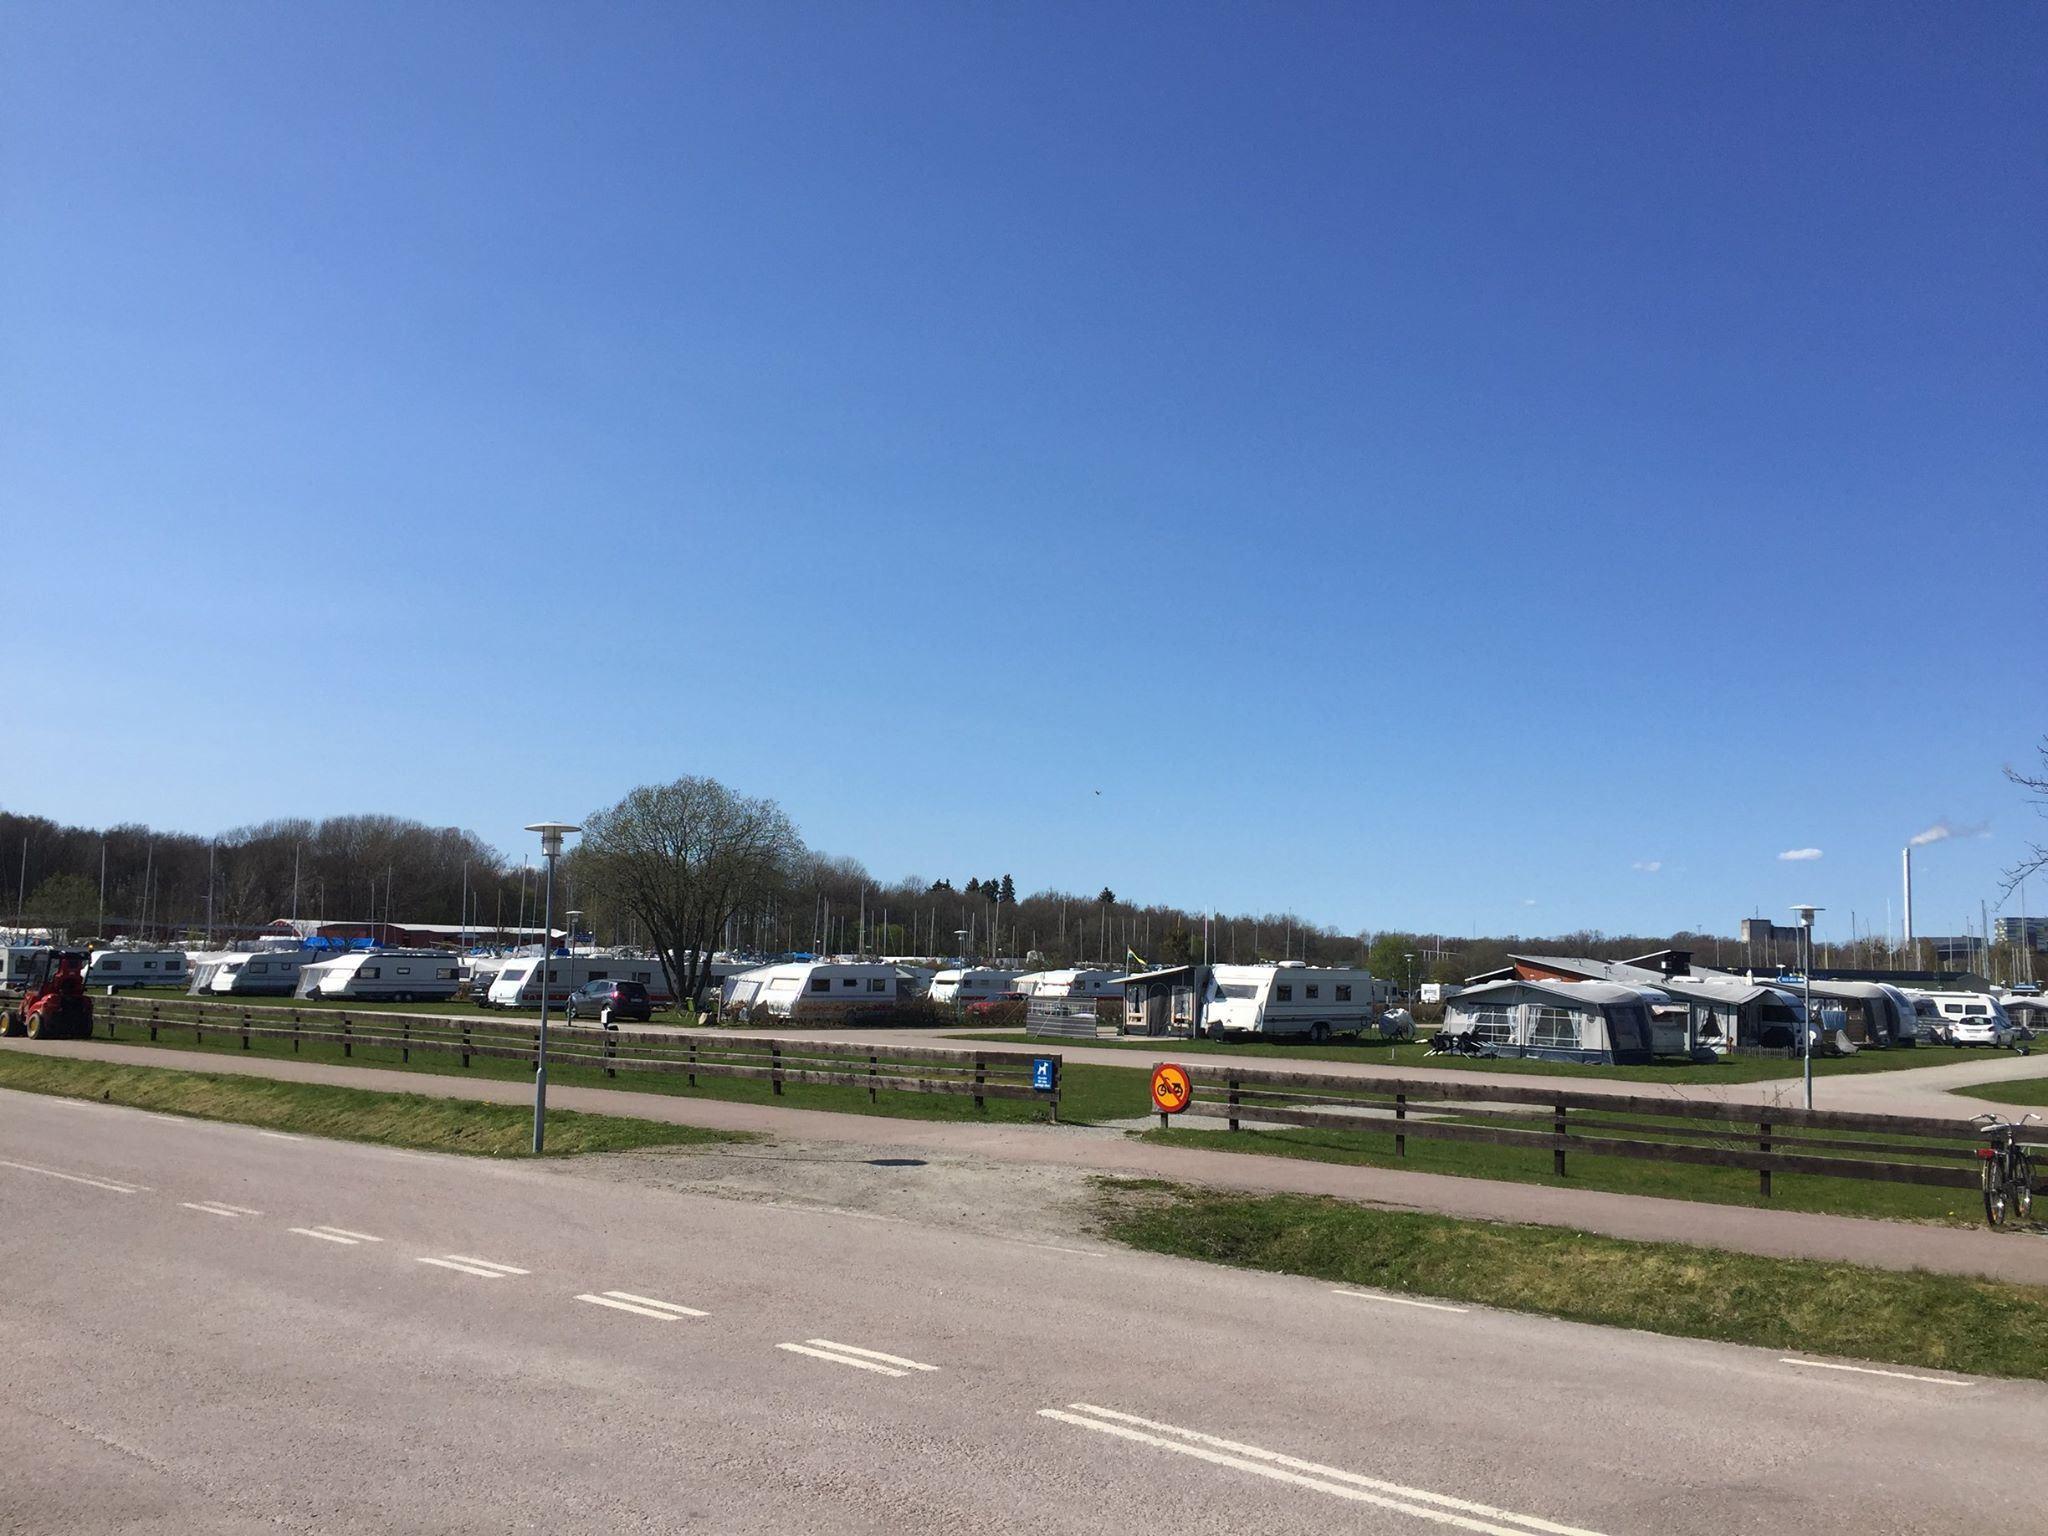 Nordic Camping Västerås/Camping